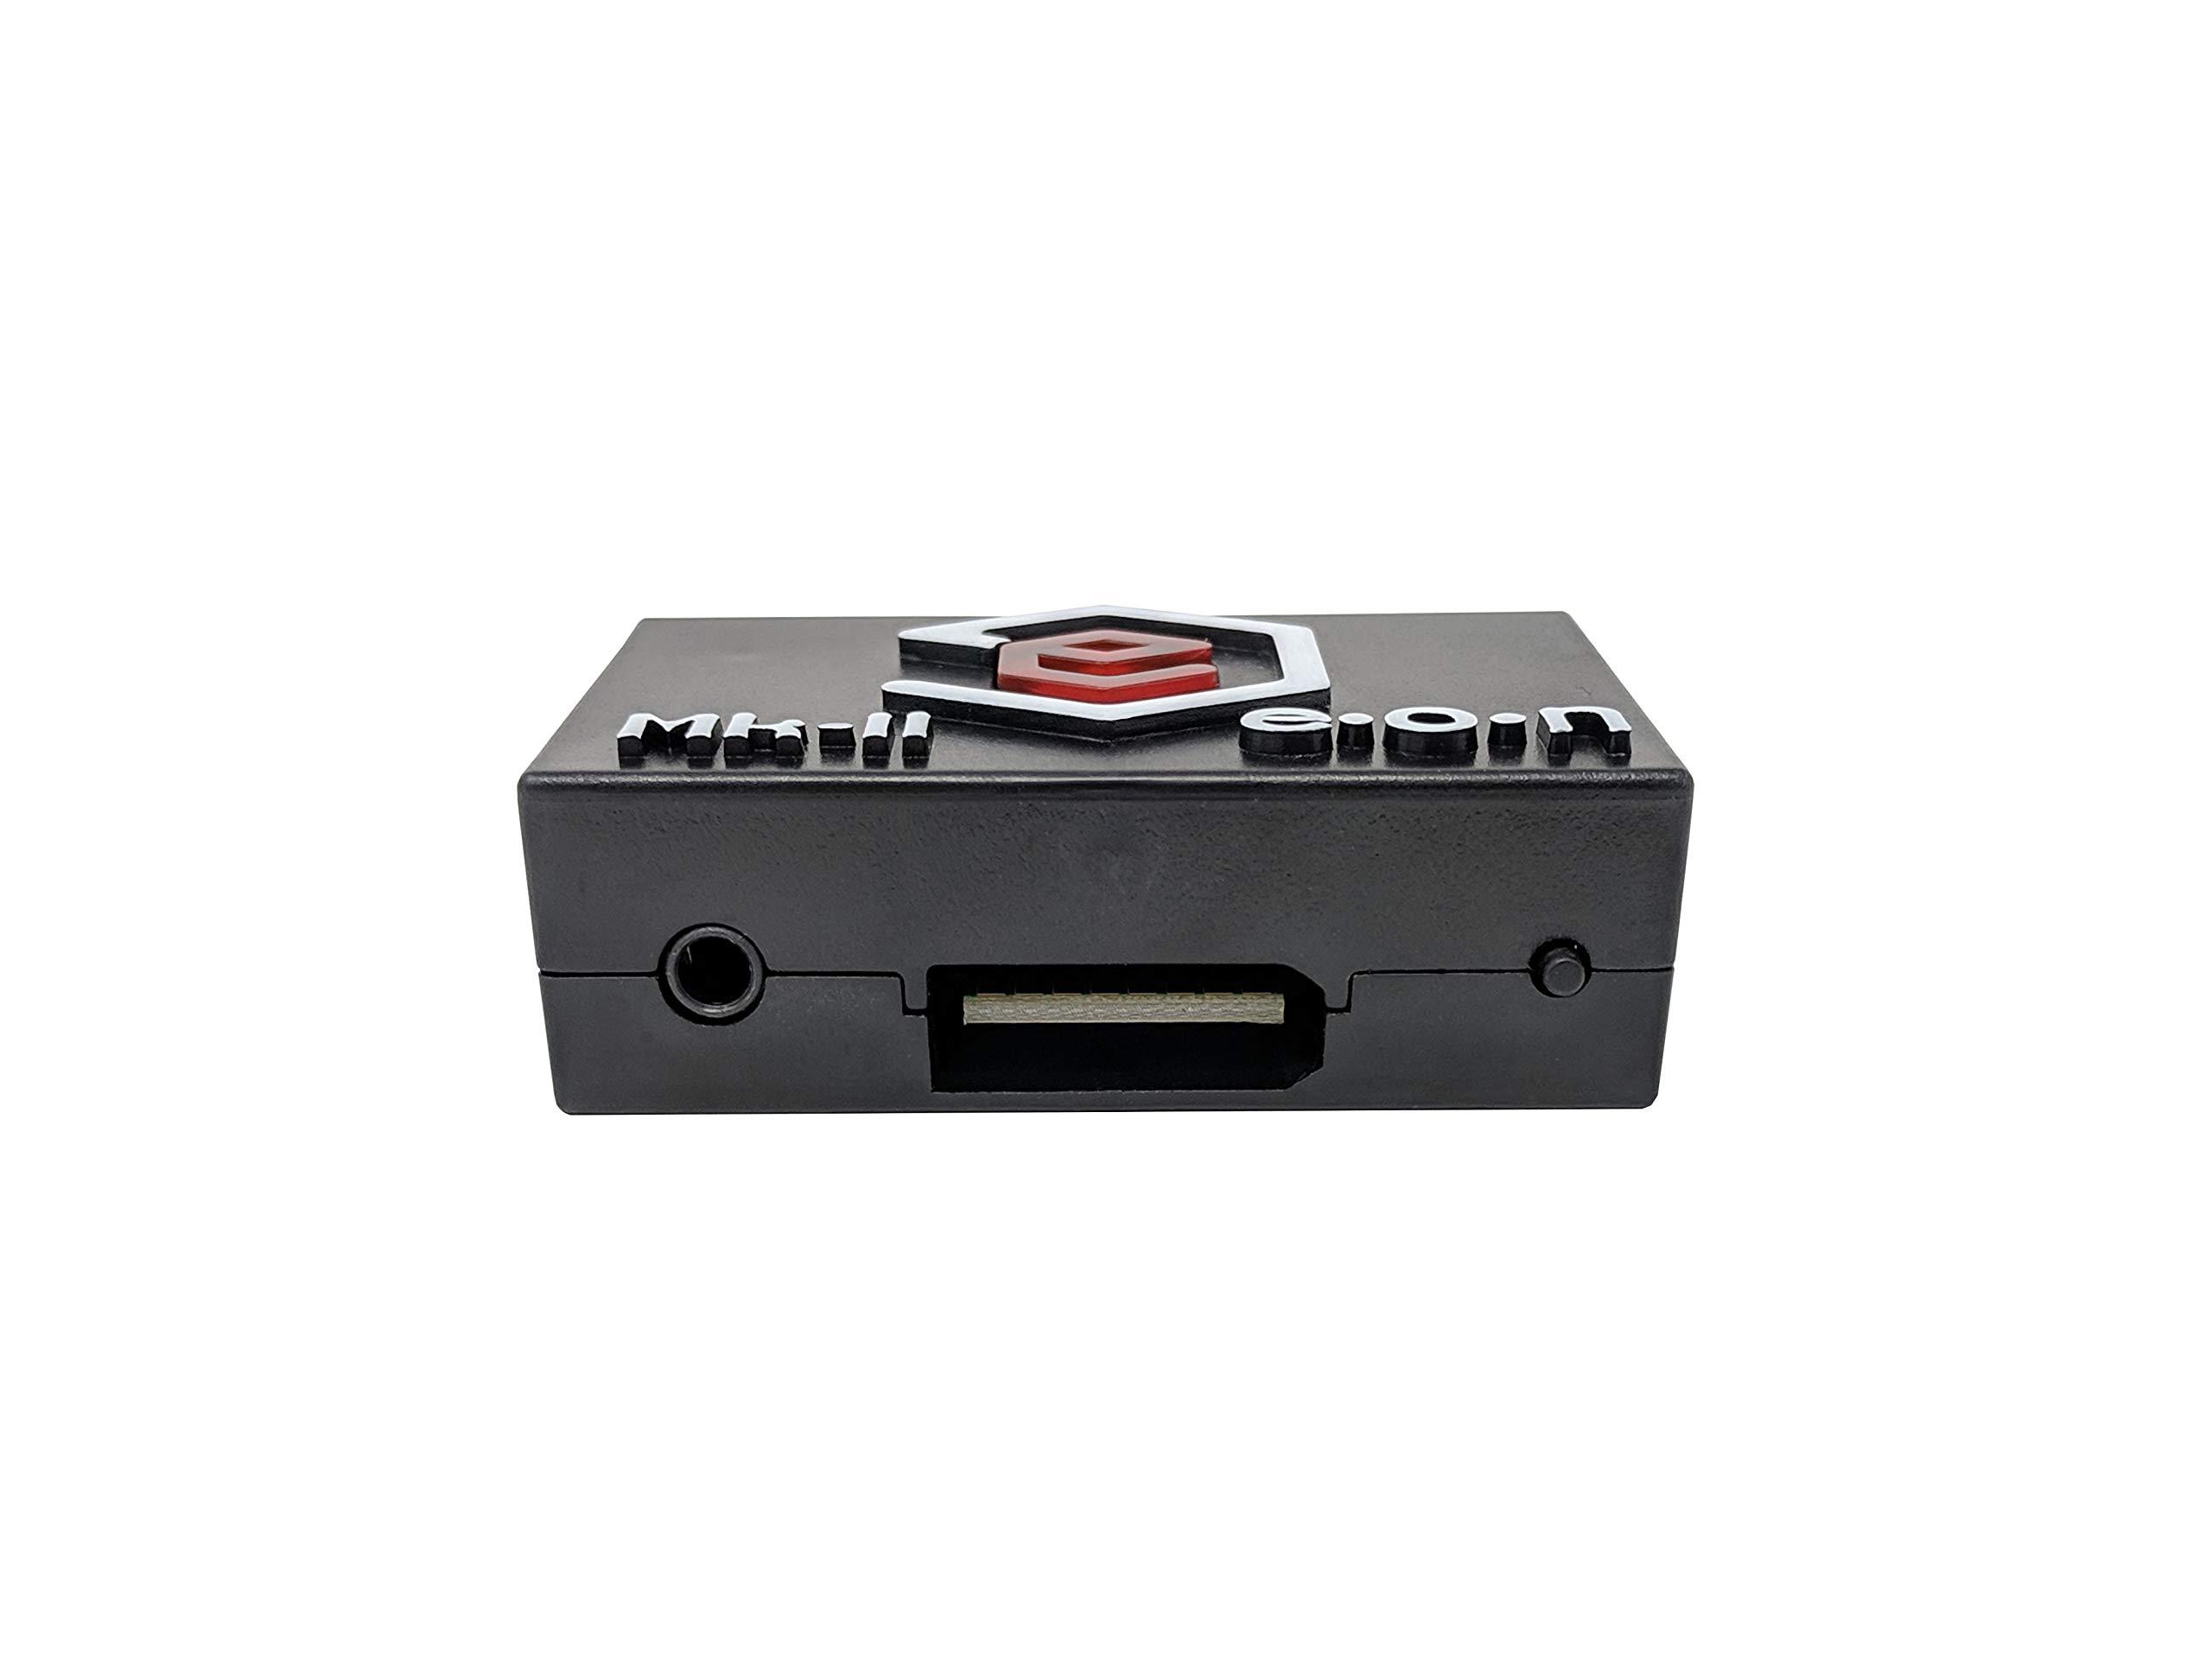 GCHD Mk-II | GameCube HDMI Adapter (RGBlack) by Eon (Image #5)